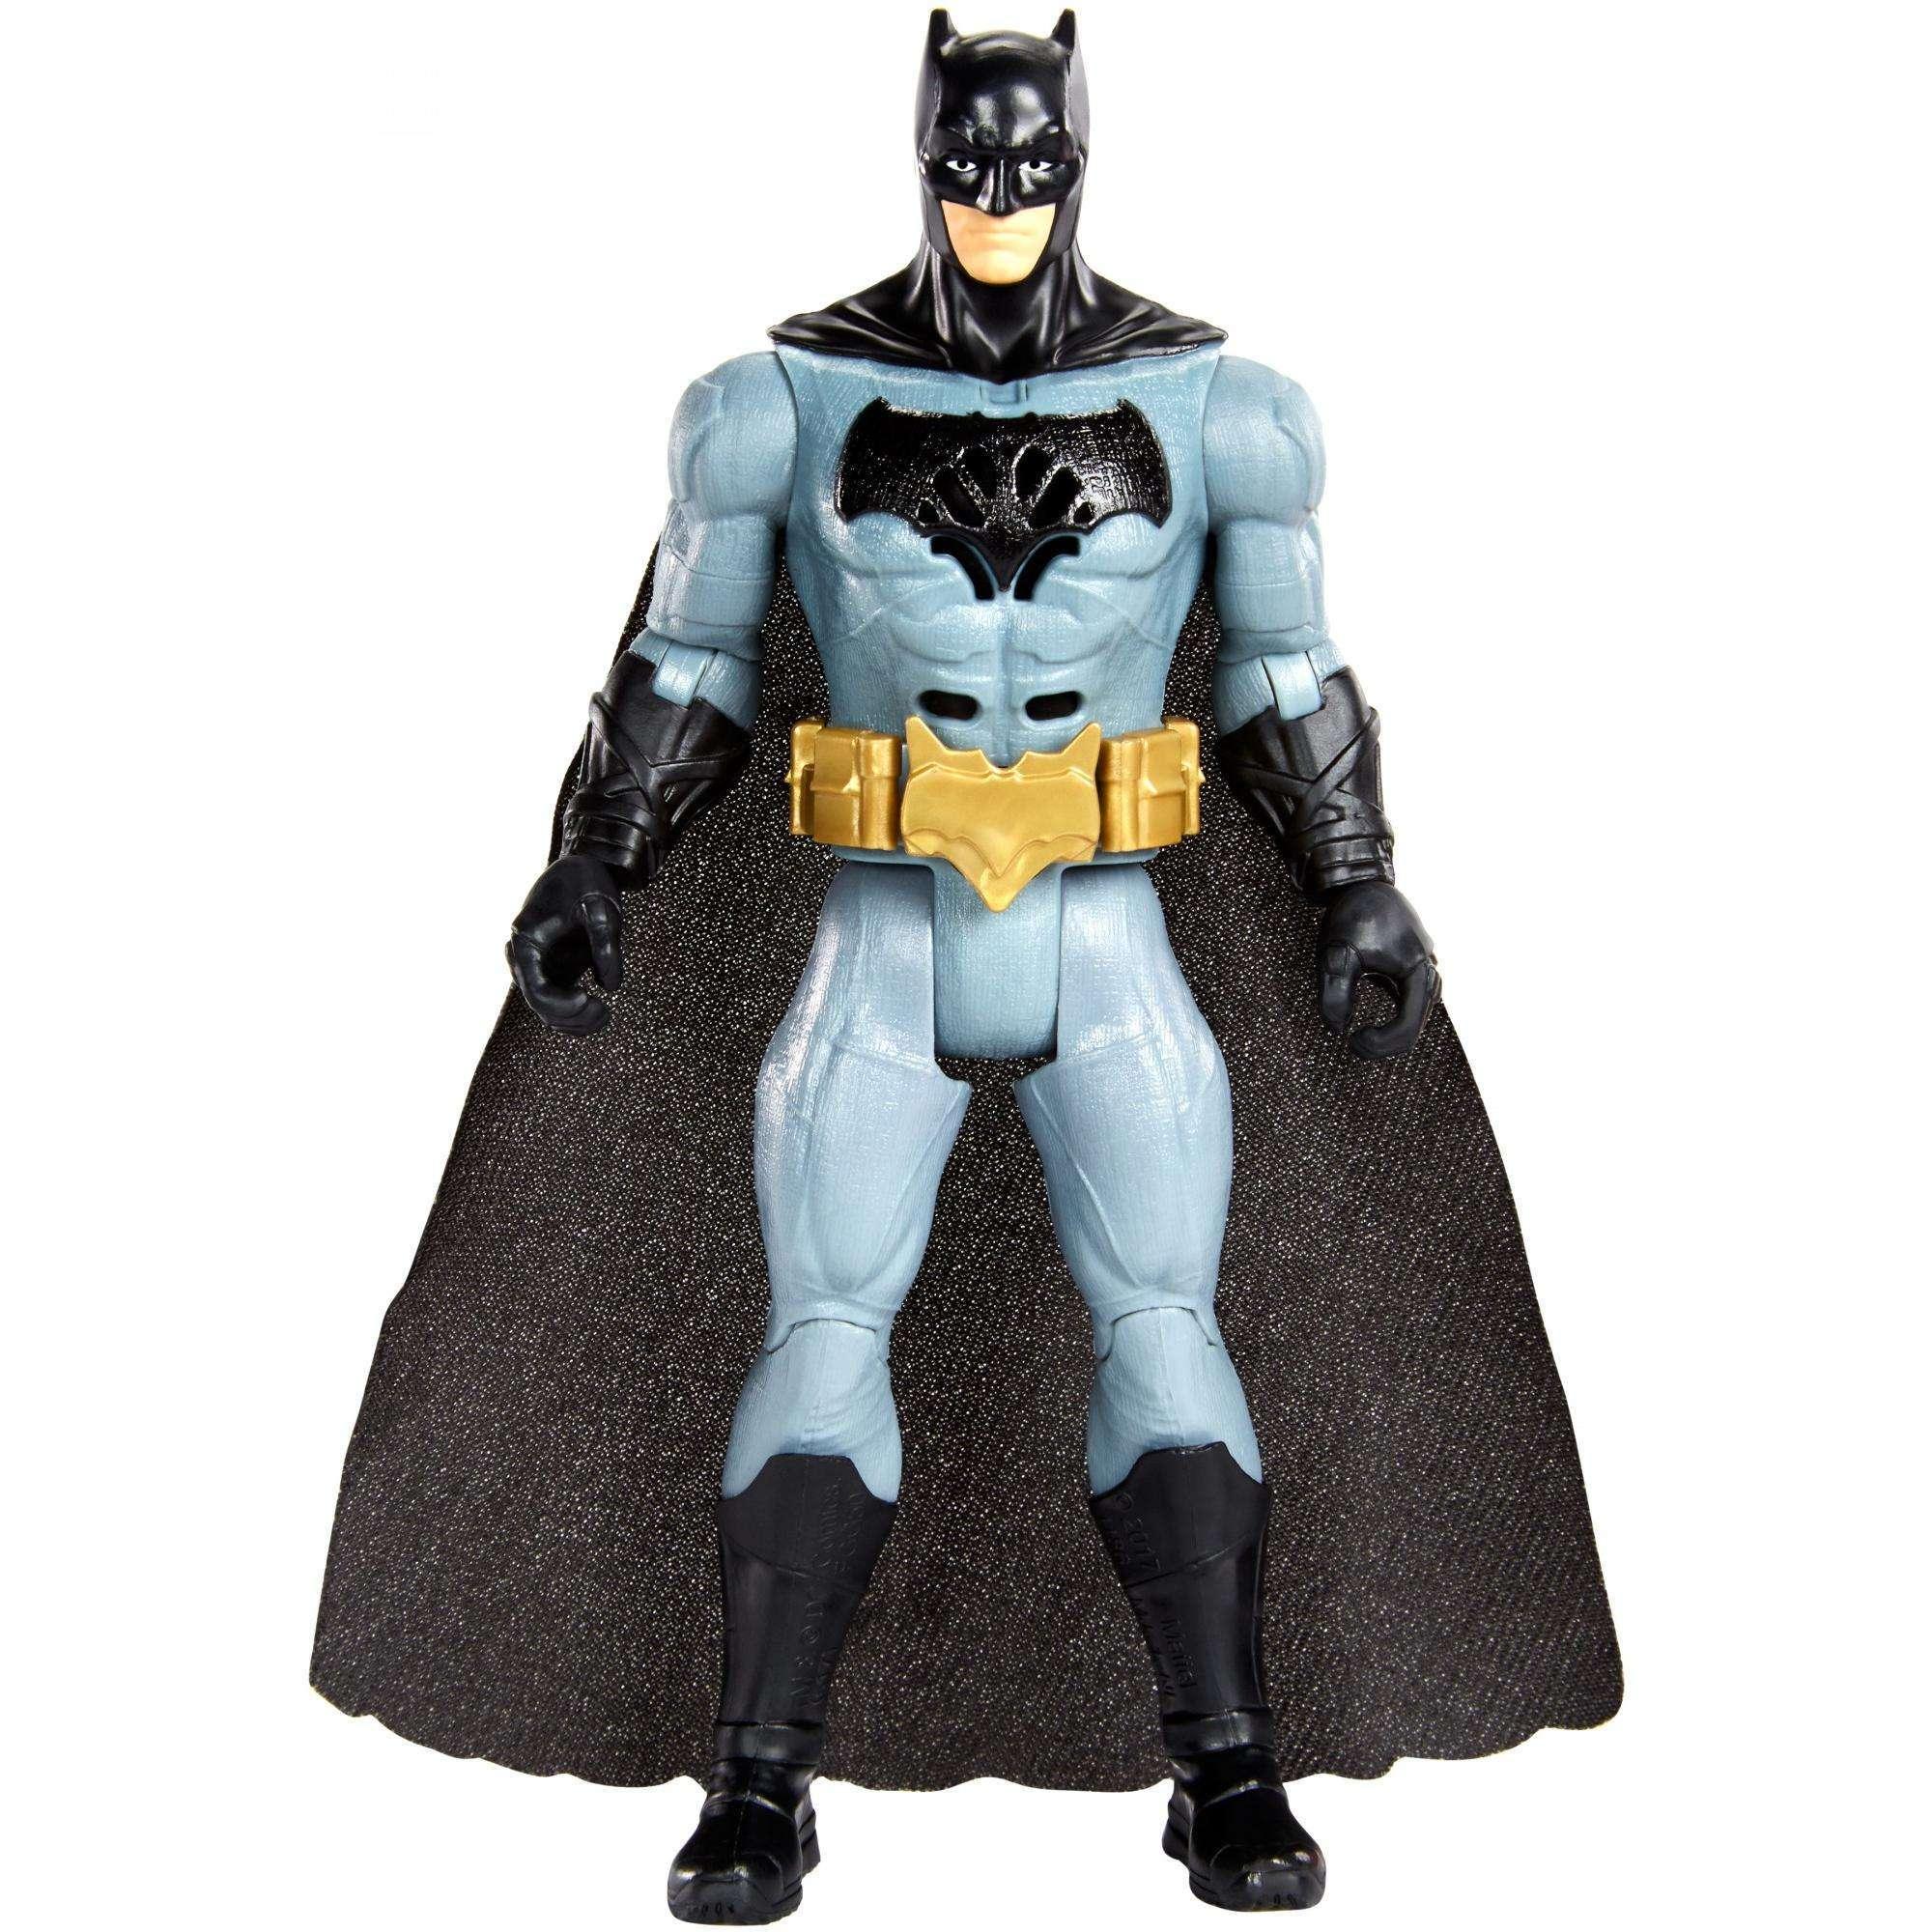 "DC Justice League Talking Heroes Batman 6"" Figure"